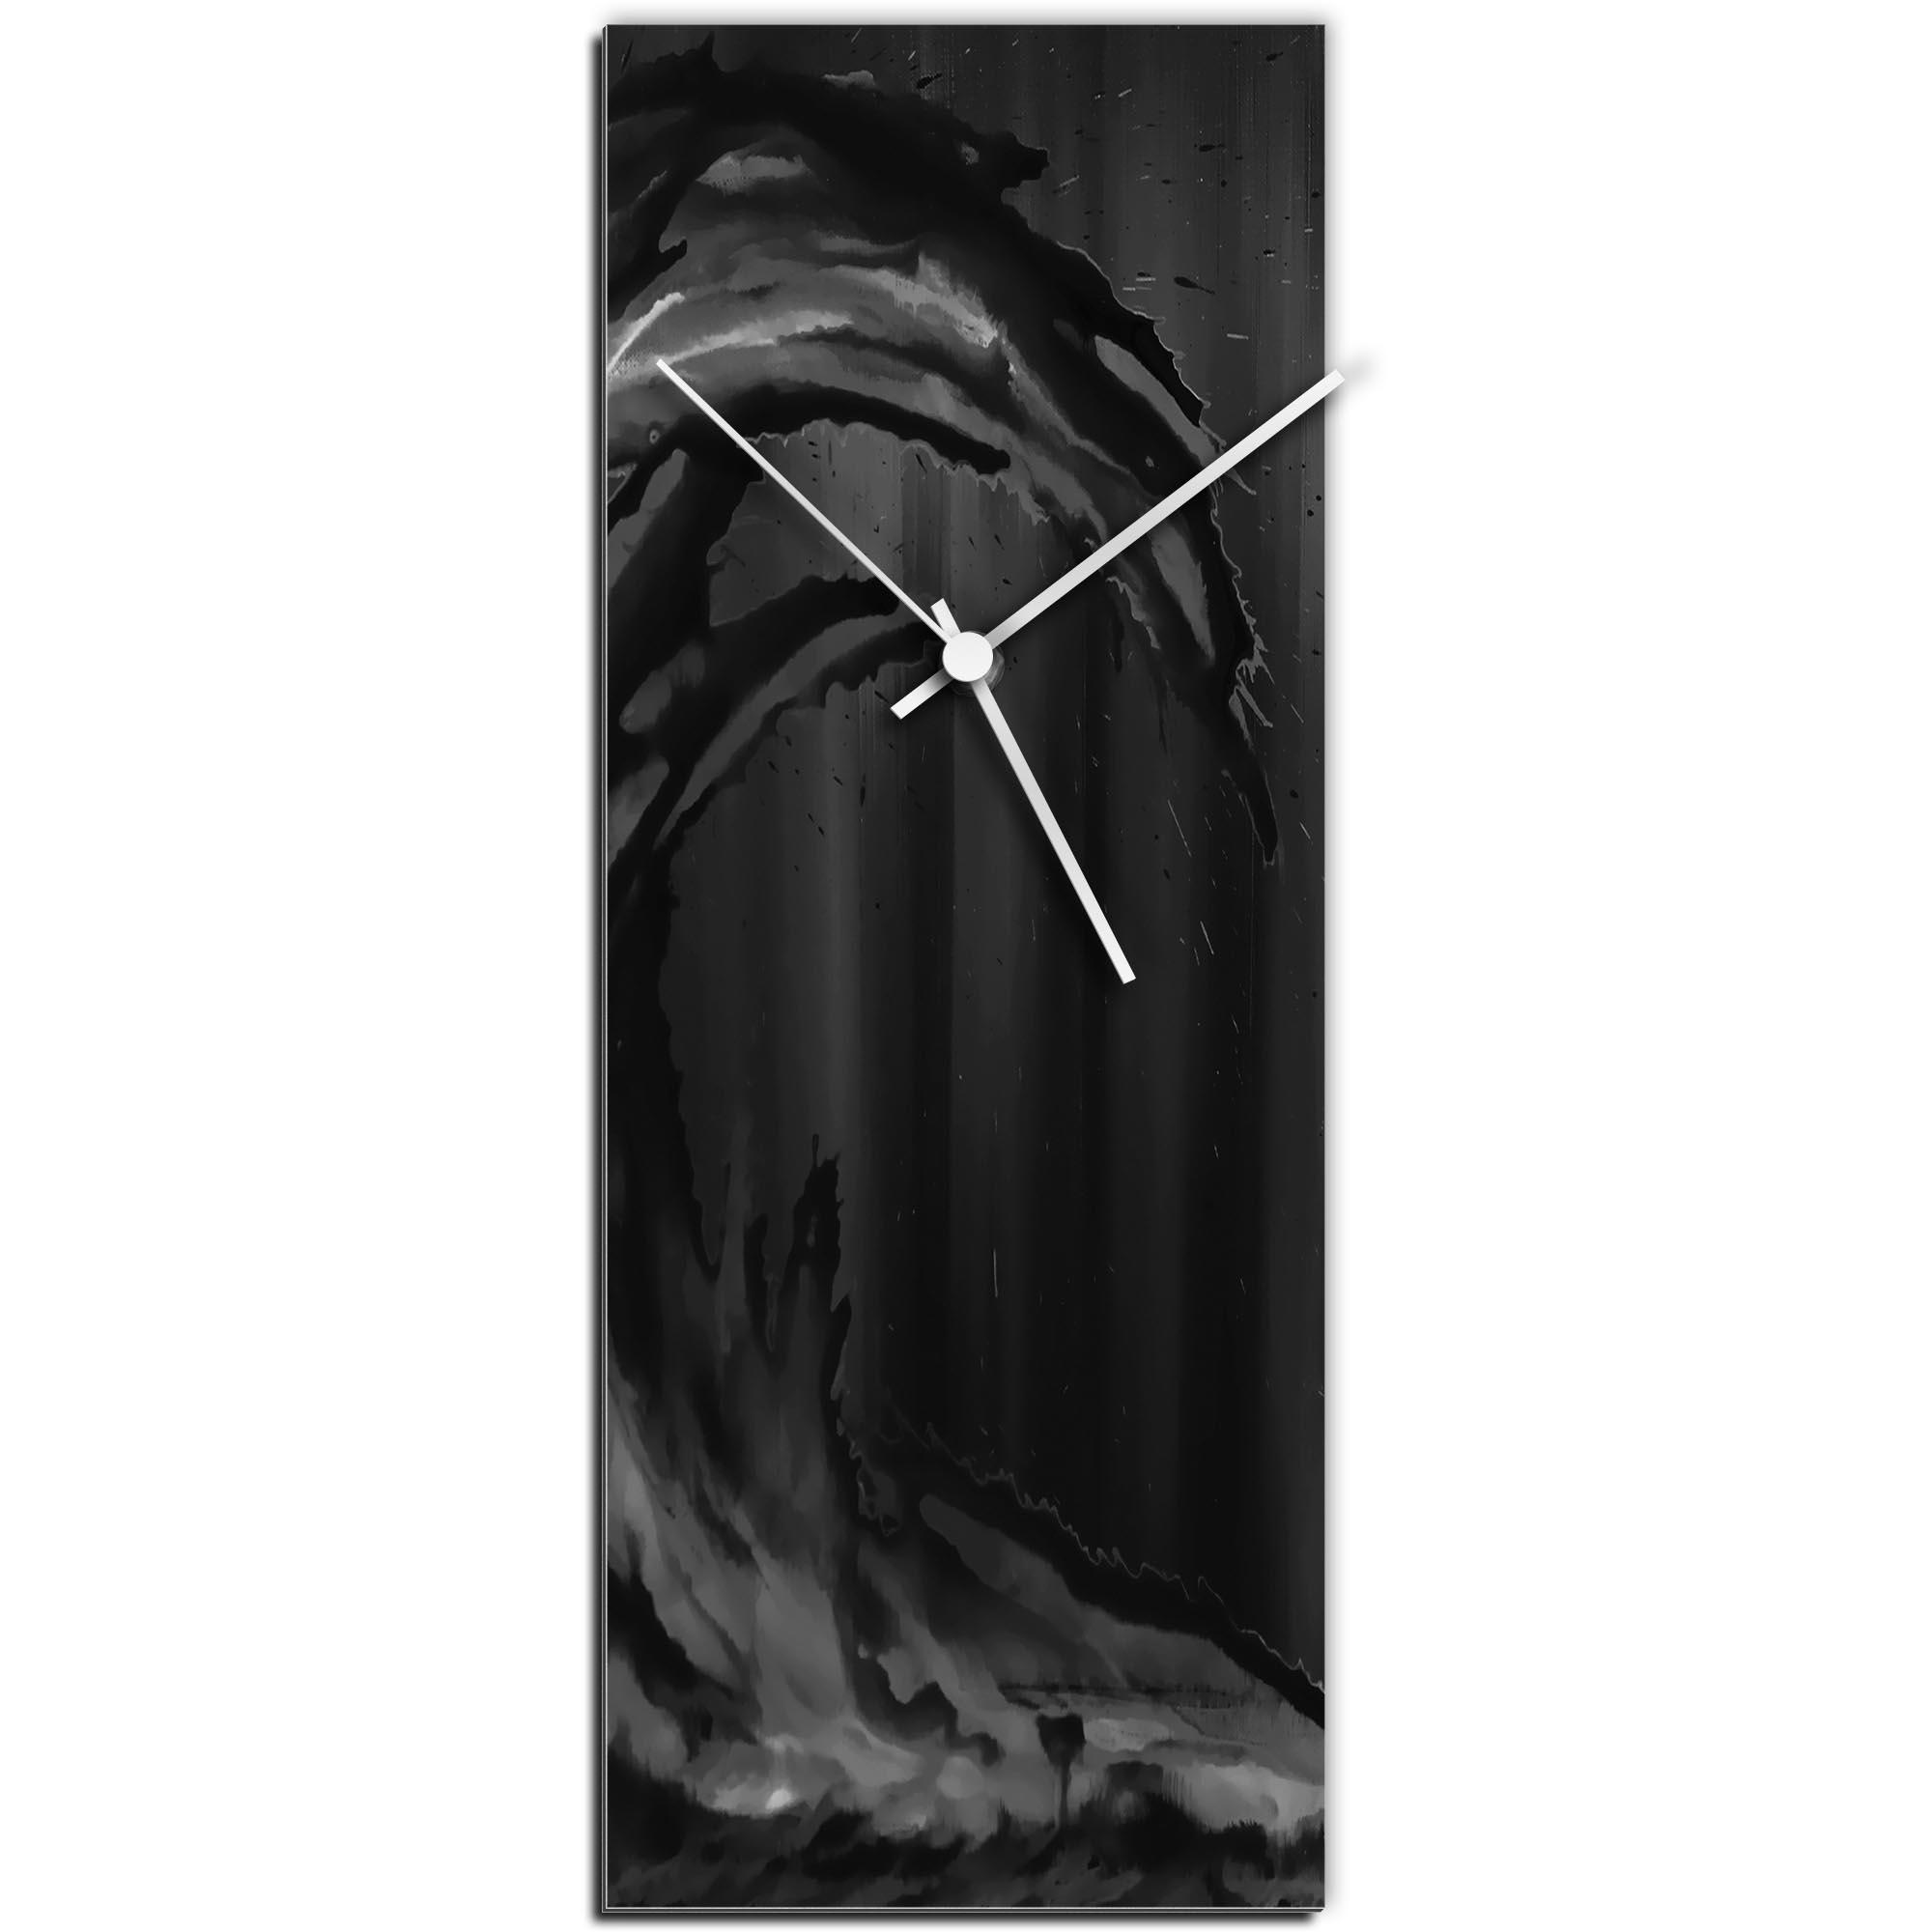 Mendo Vasilevski 'Black Wave v1 Clock Large' 9in x 24in Modern Wall Clock on Aluminum Composite